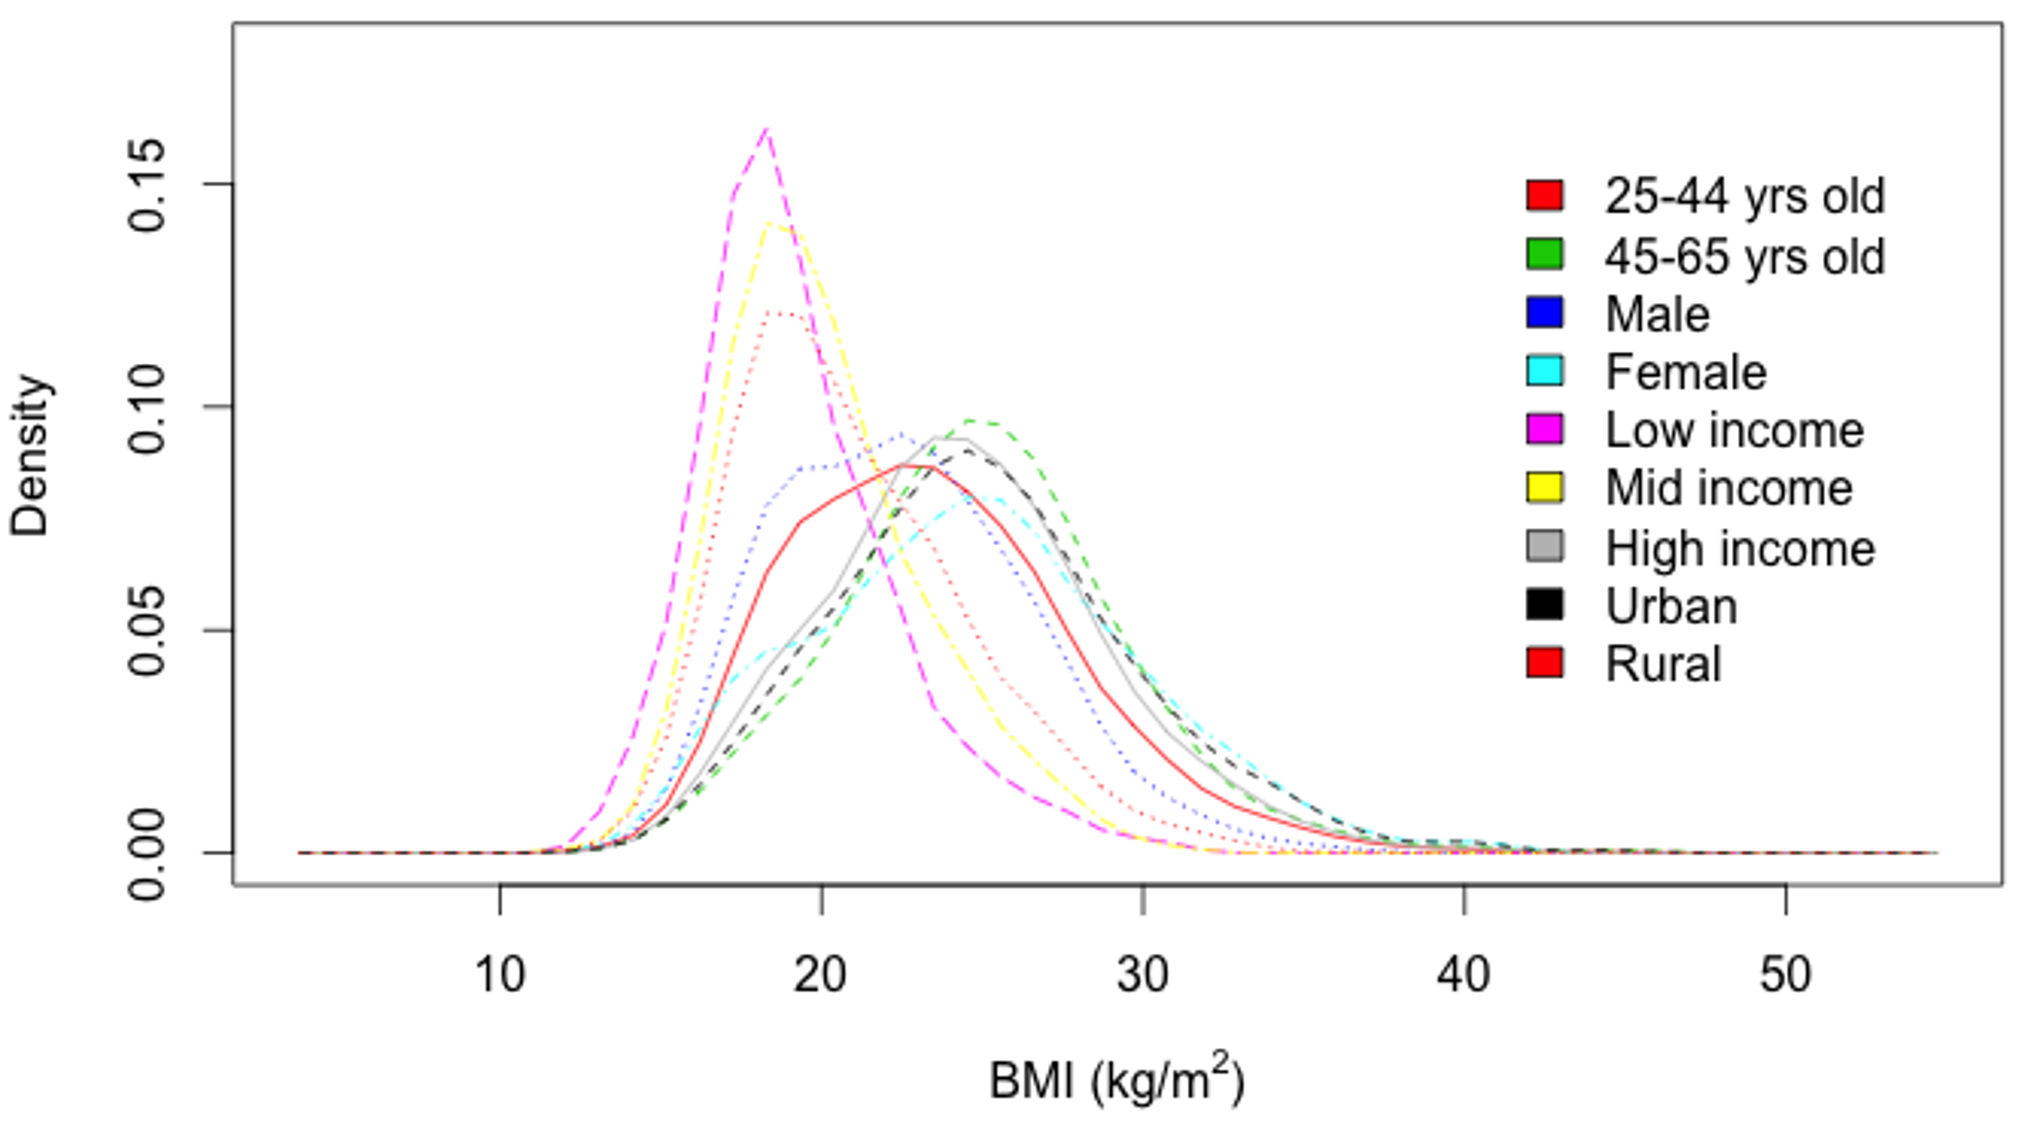 "Body mass index (BMI) distributions among cohorts (kg/m<sup>2</sup>), 2010 <em class=""ref"">[31]</em>."